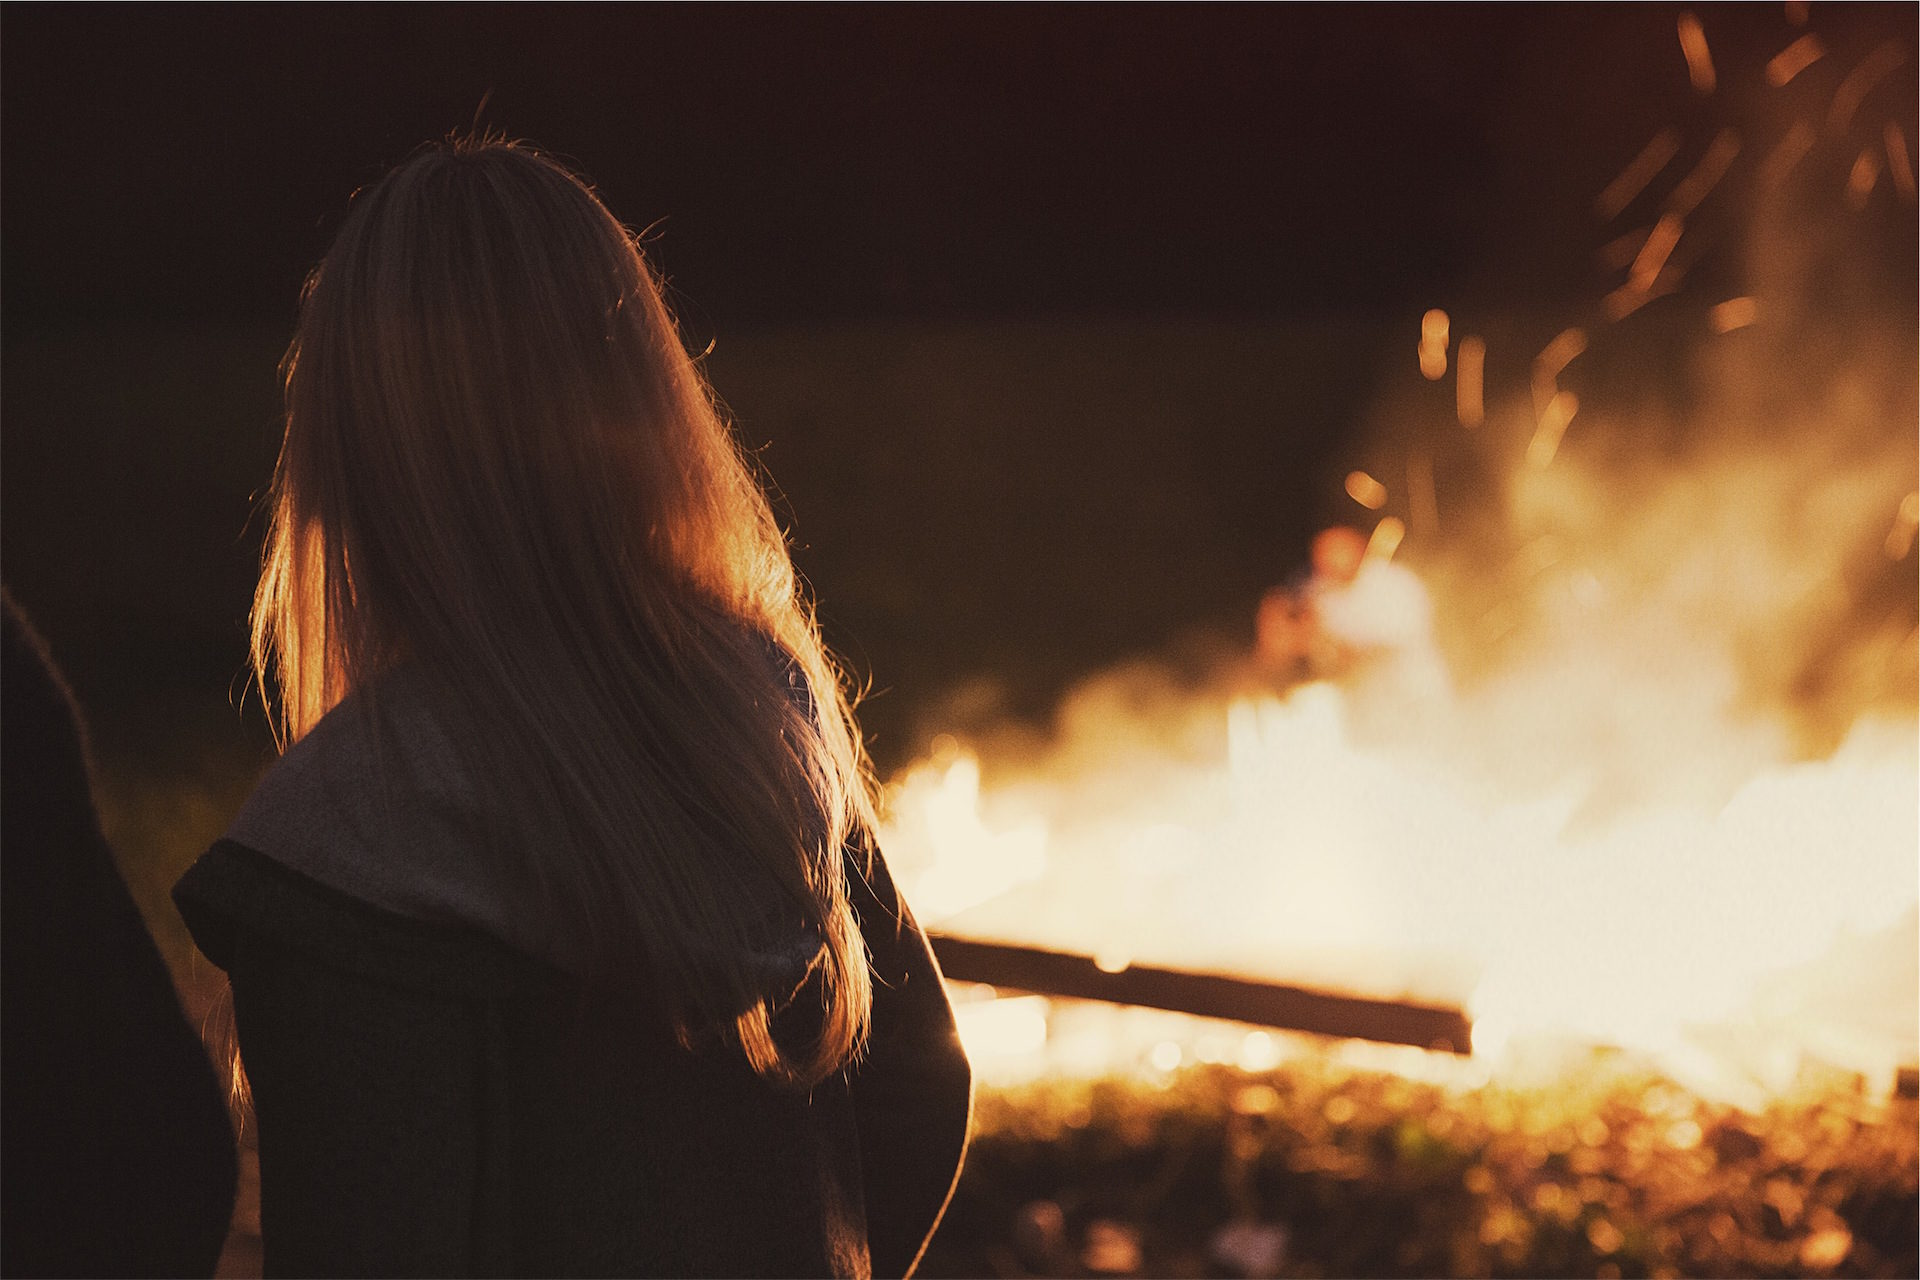 hoguera, φωτιά, γυναίκα, Φούτερ, νύχτα - Wallpapers HD - Professor-falken.com